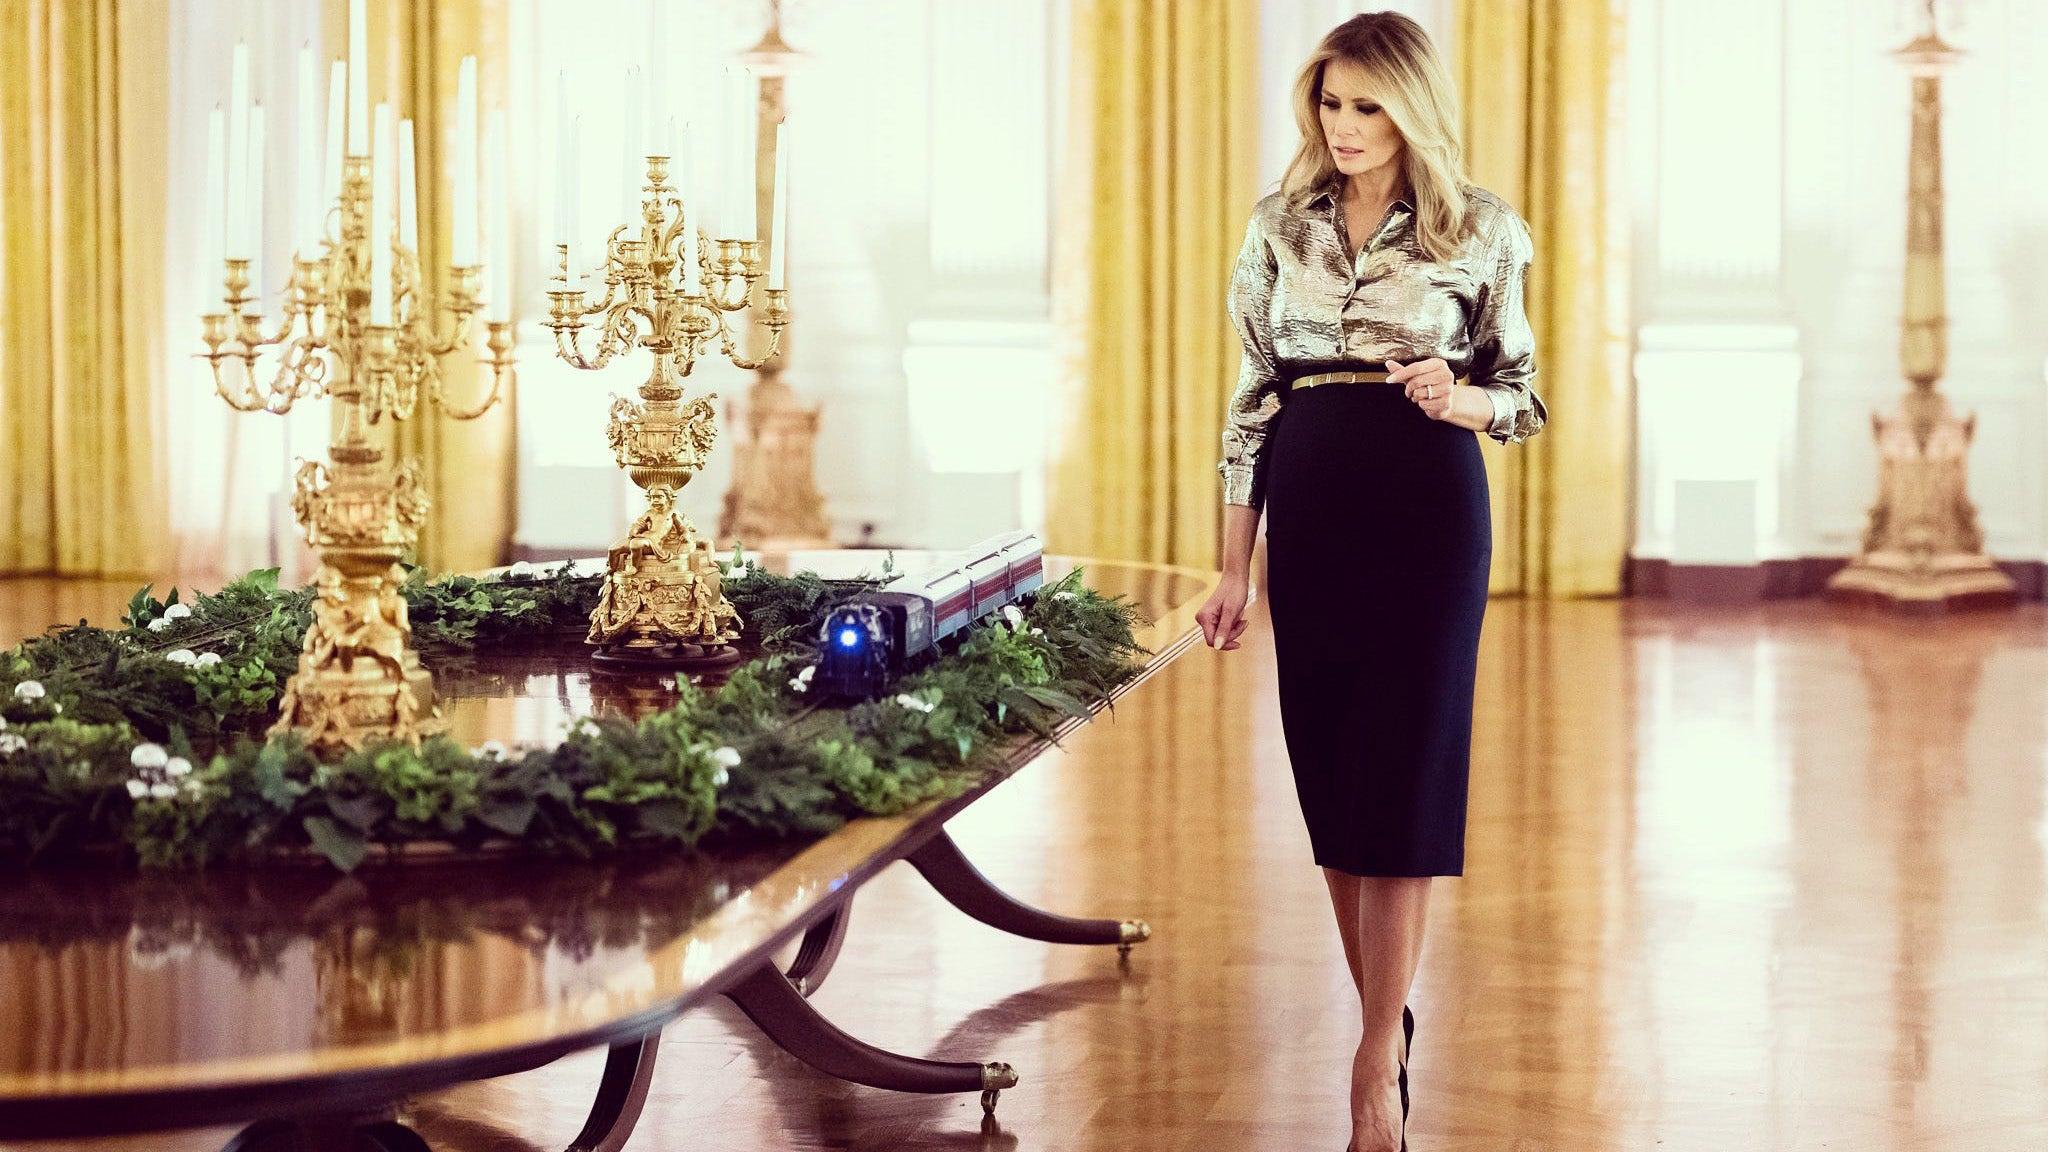 Melania Trump unveils White House Christmas decorations theme for 2020 – Fox News